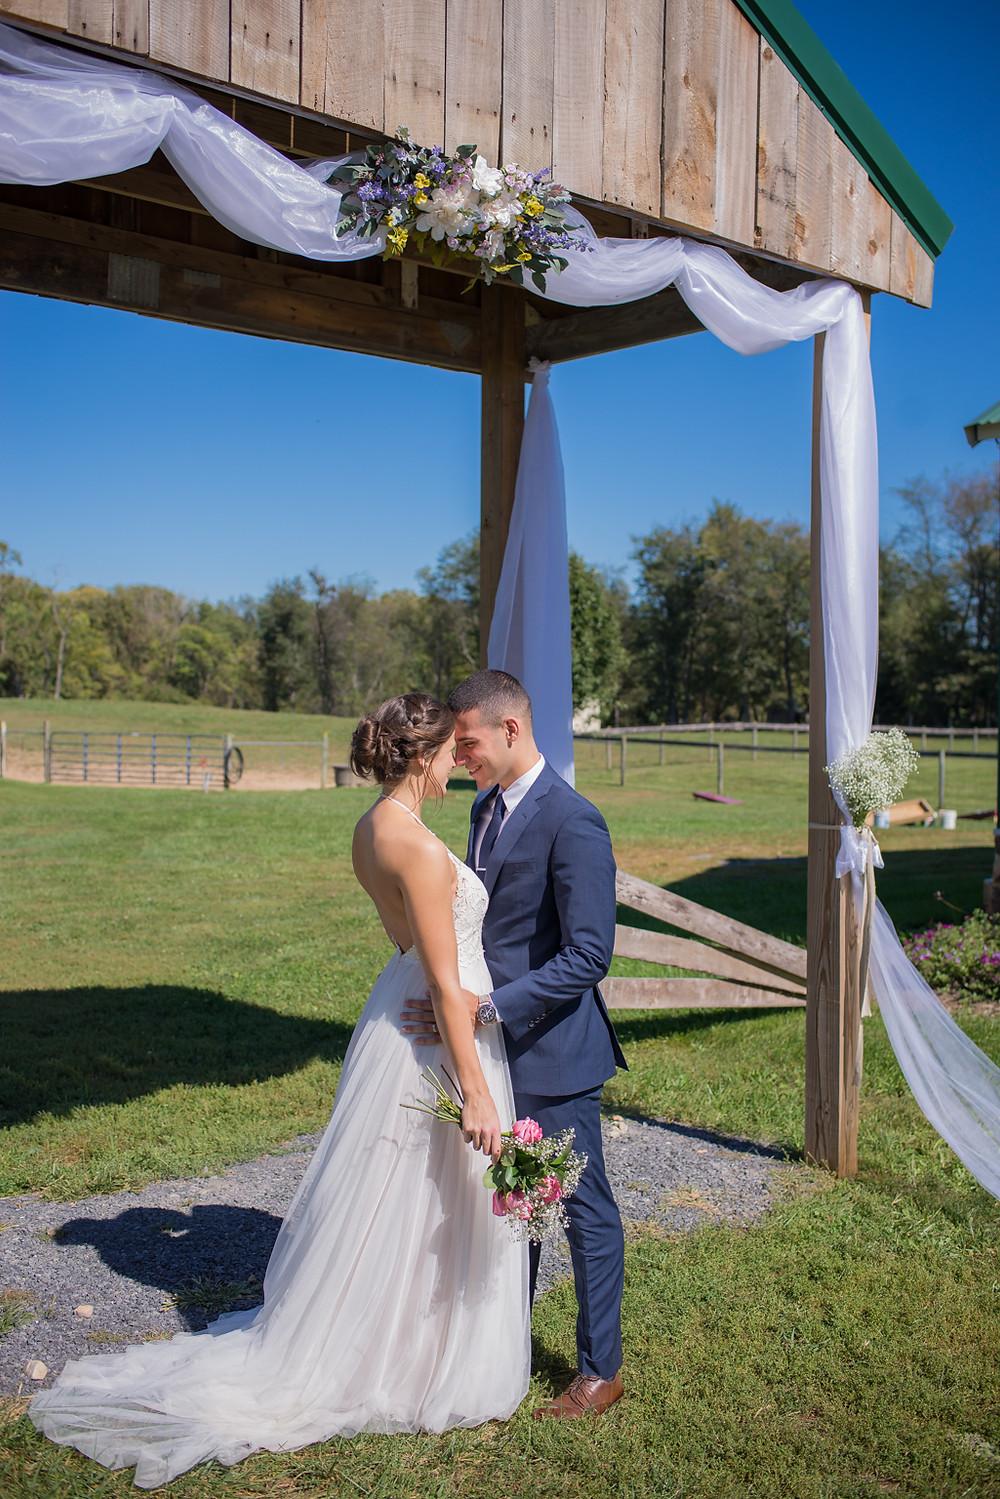 Jacqueline Binkley Photography - The Barns at Maple Valley Farm LLC VA